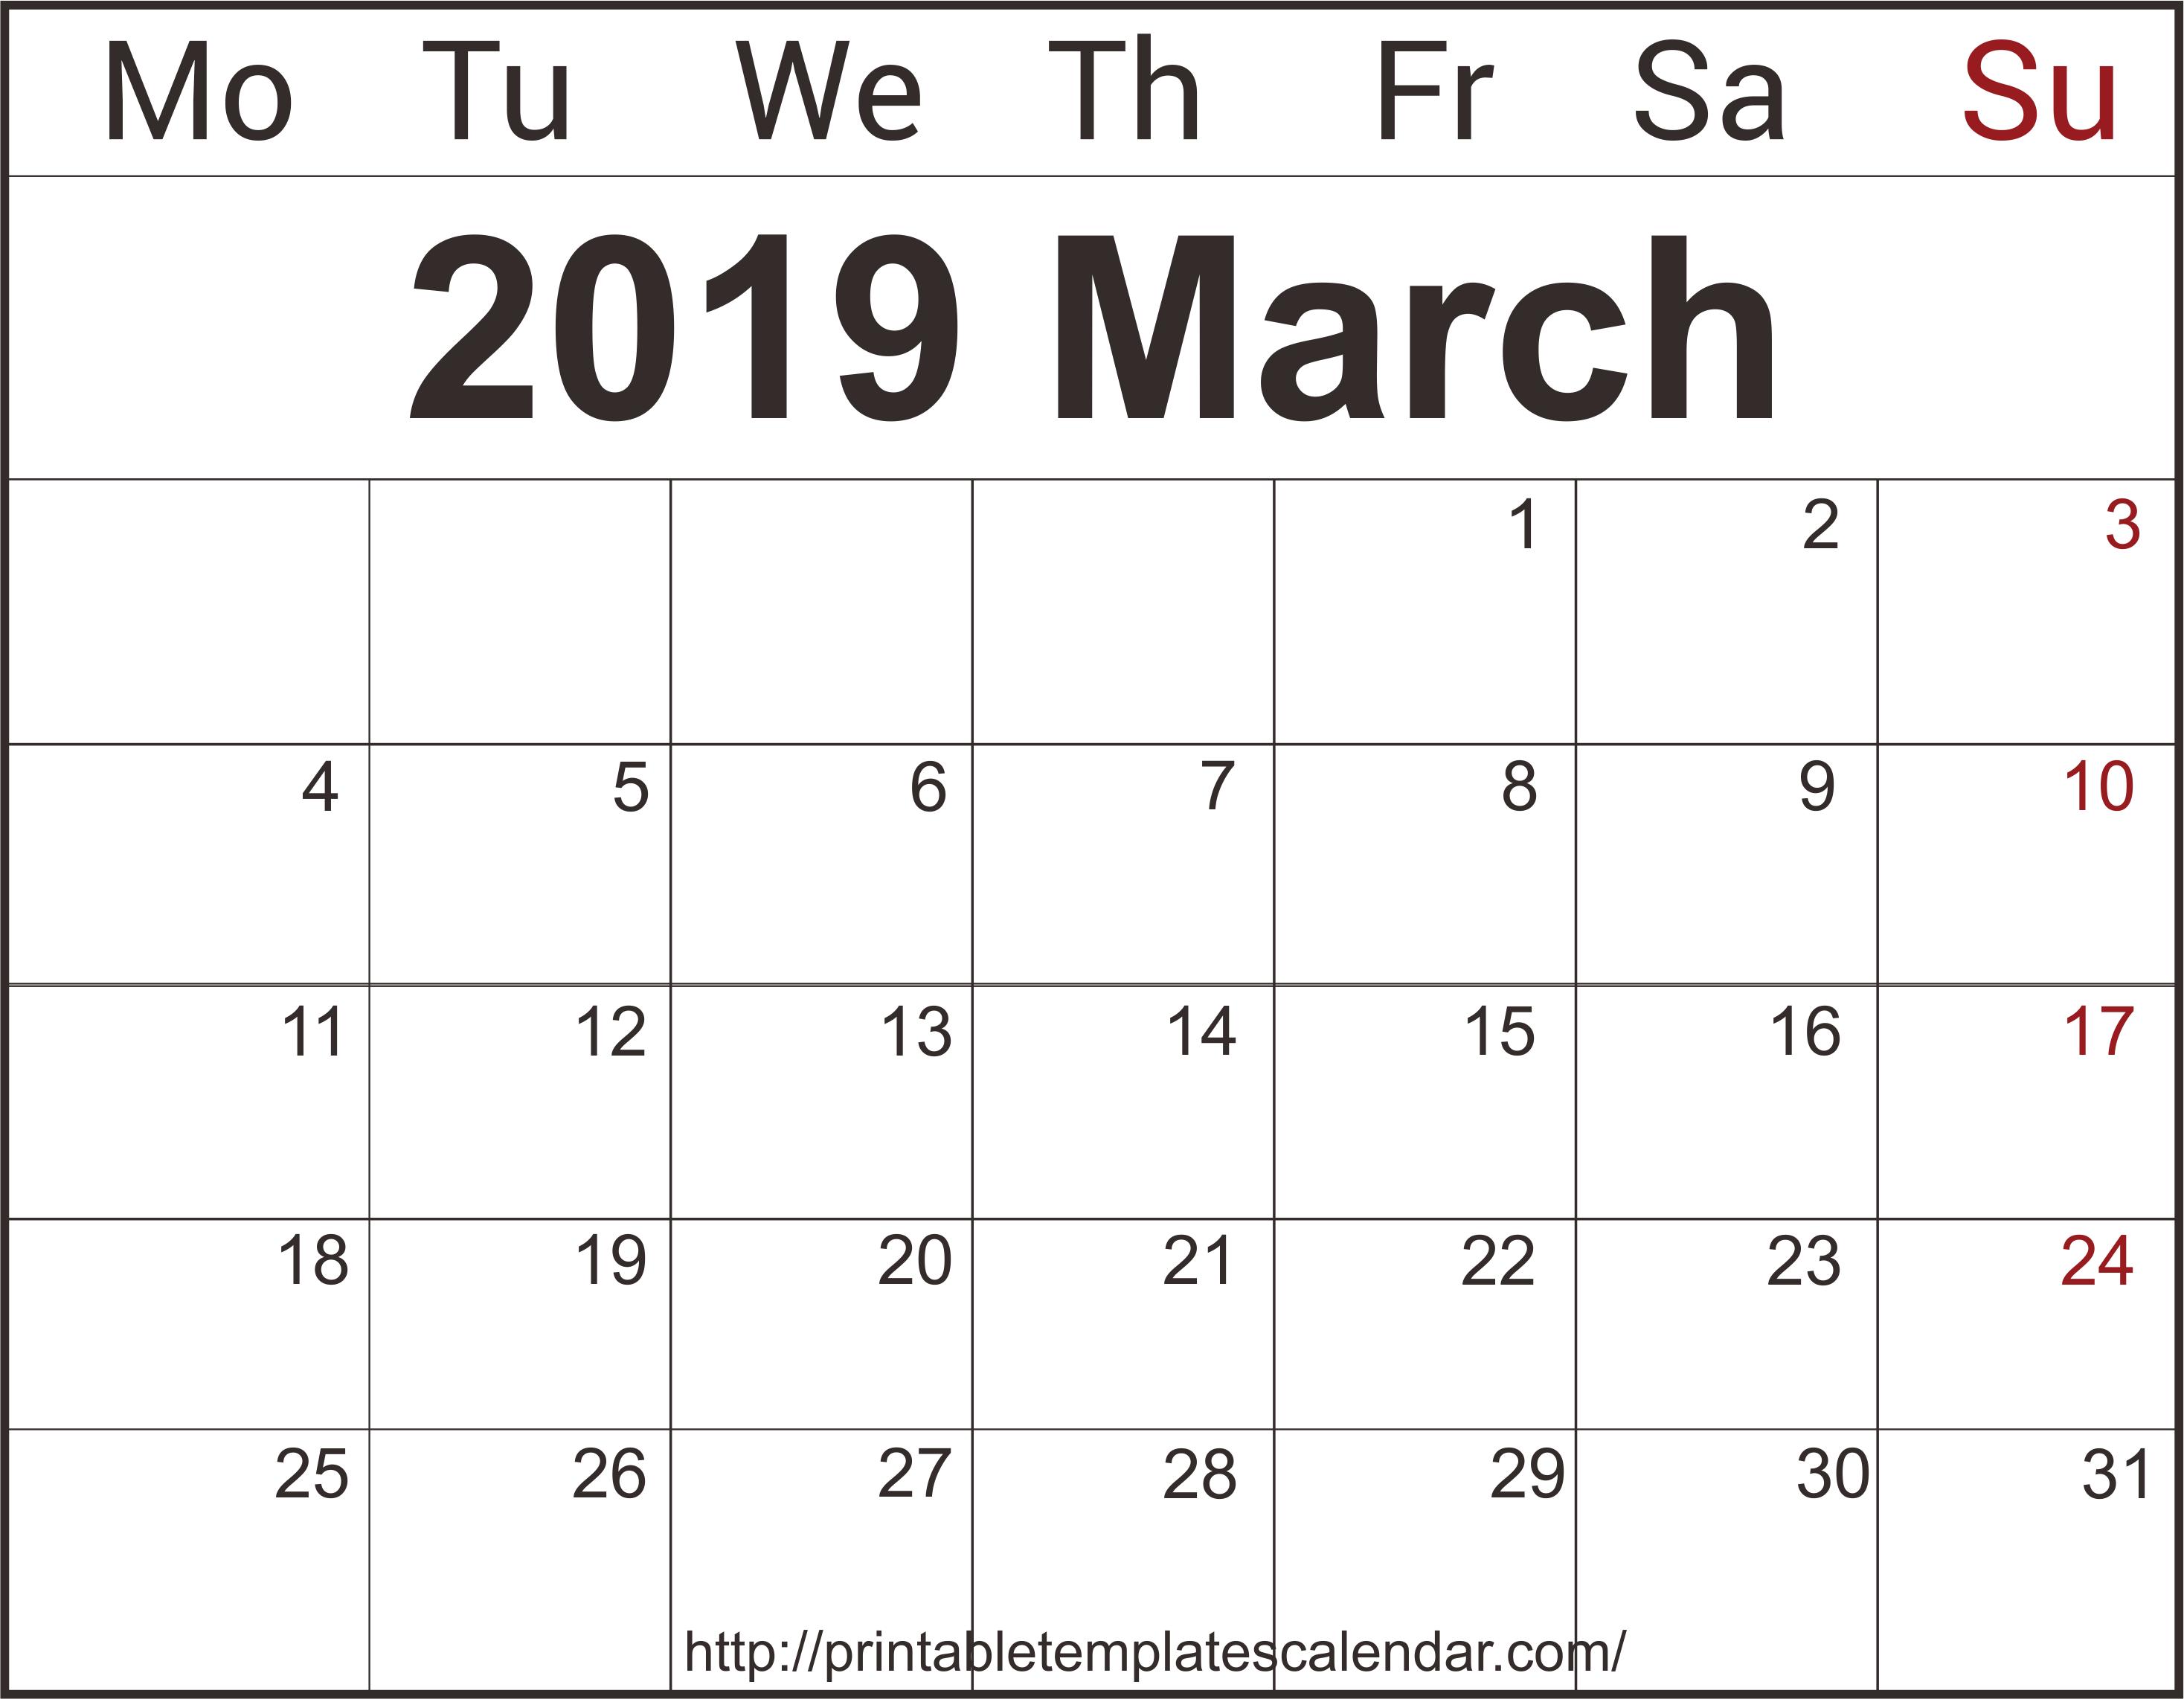 March 2019 Calendar Editable Template